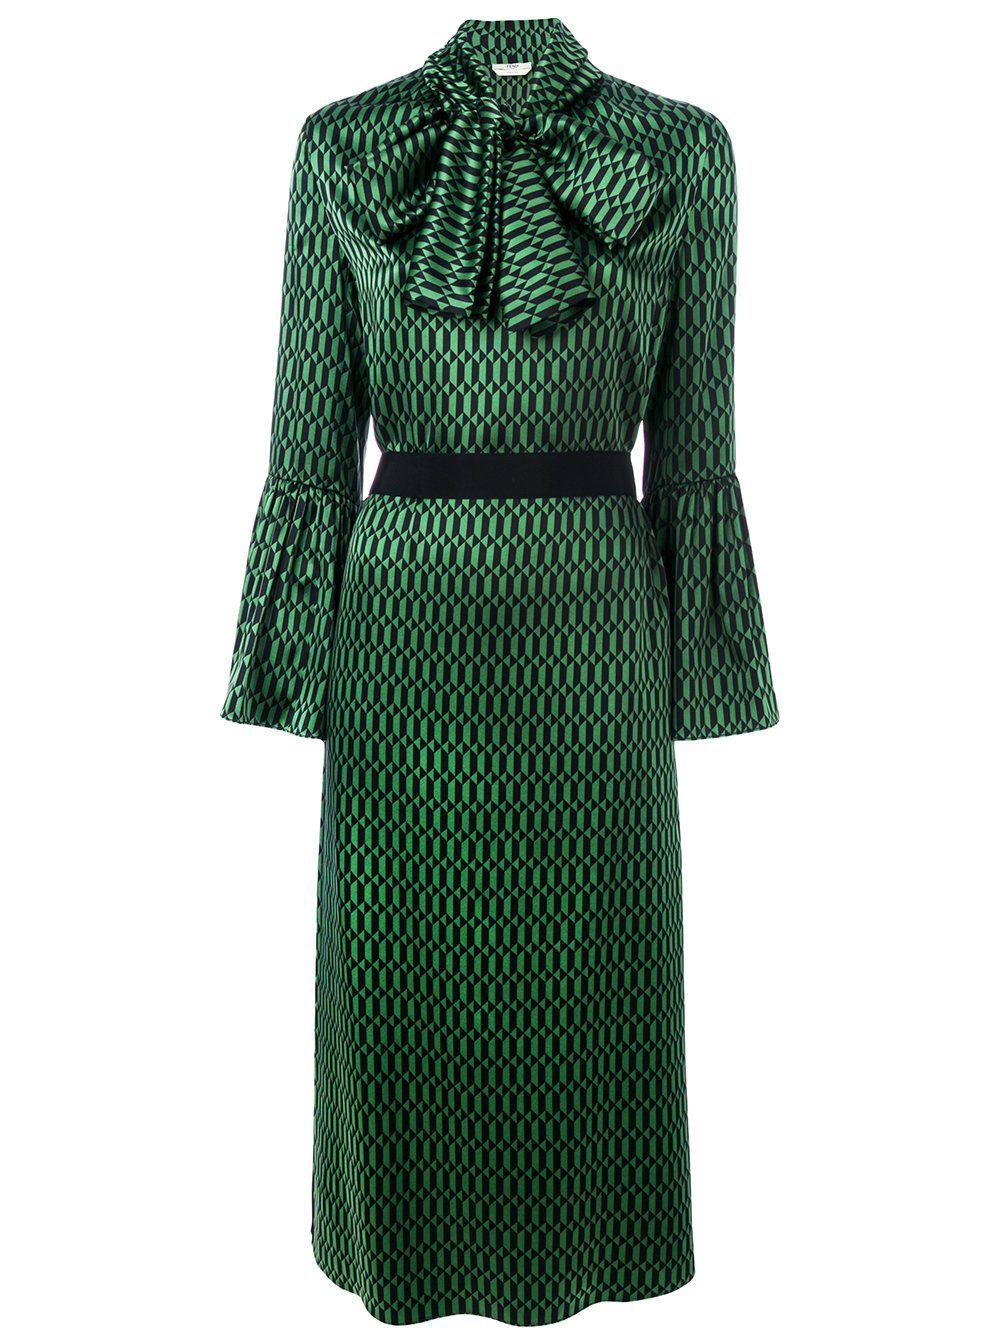 Designer Cocktail Dresses - Party Dresses